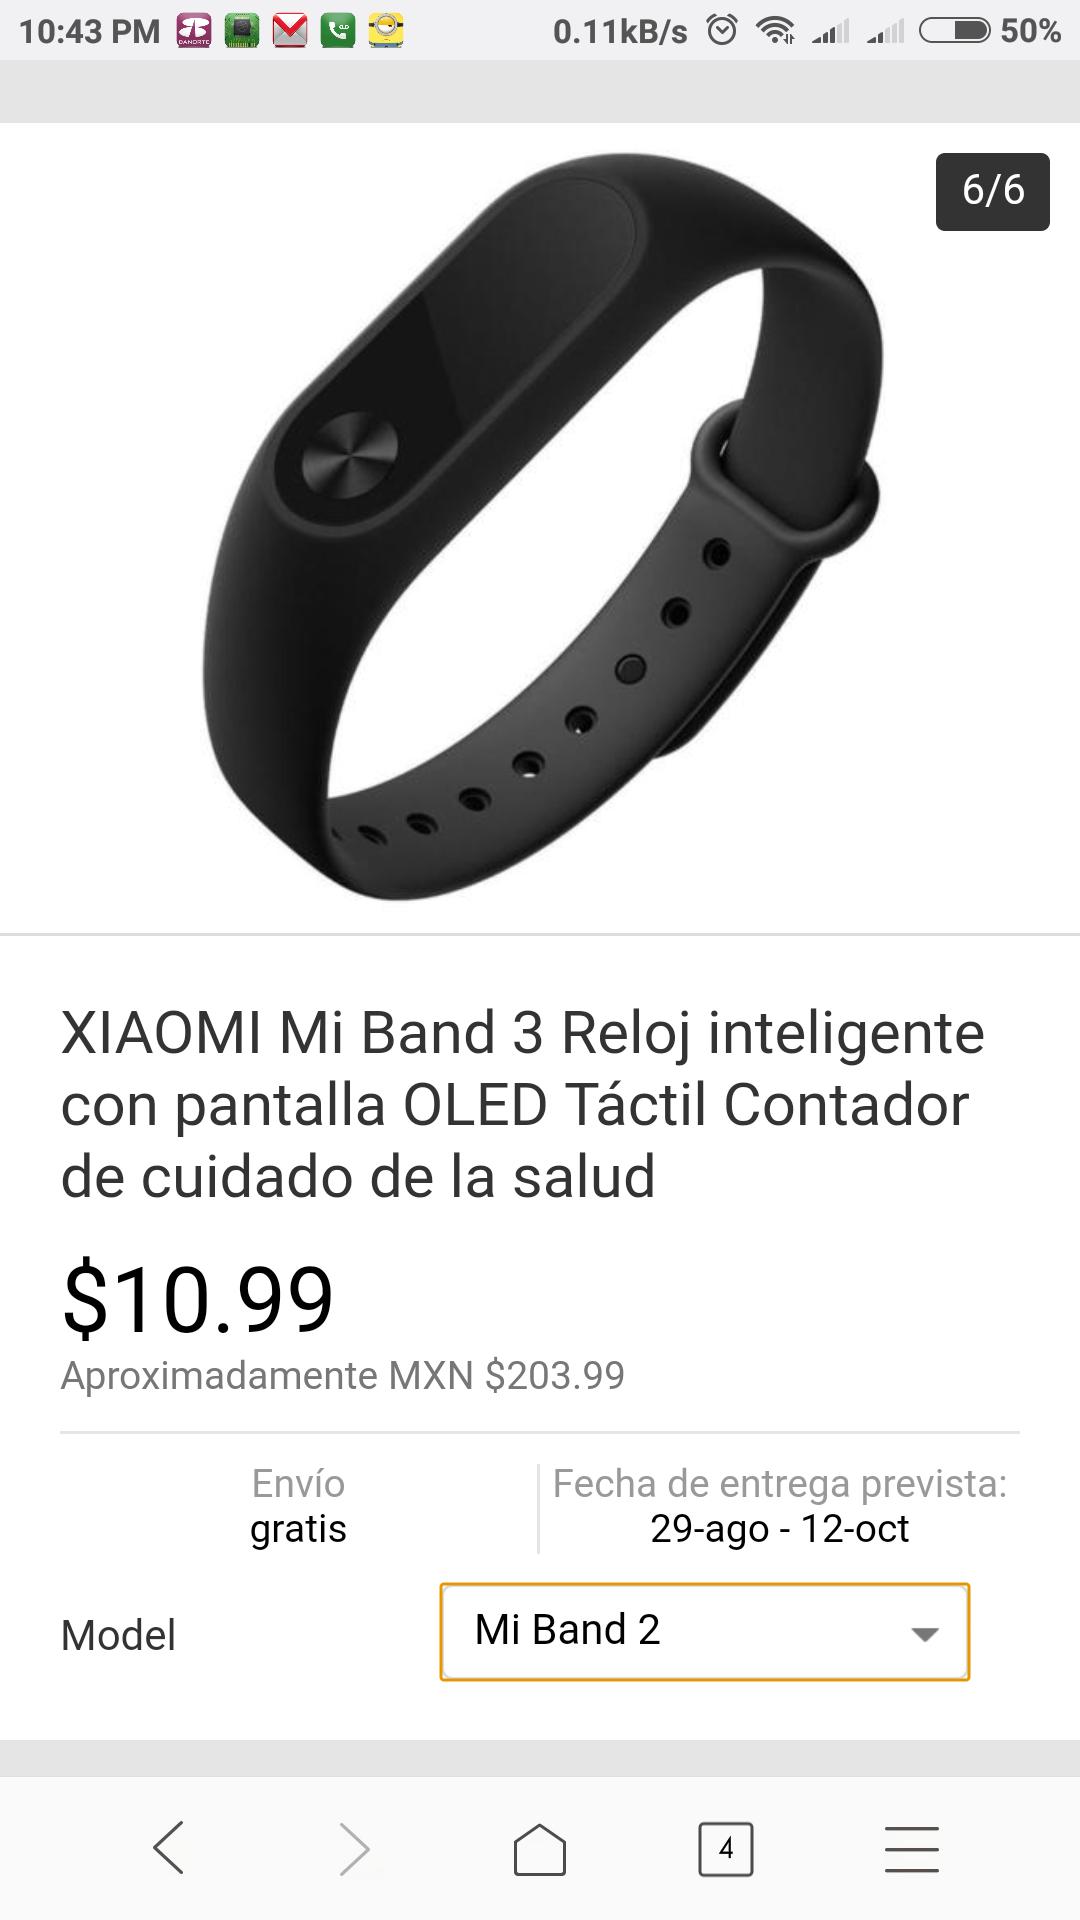 eBay: Xiaomi mi band 2